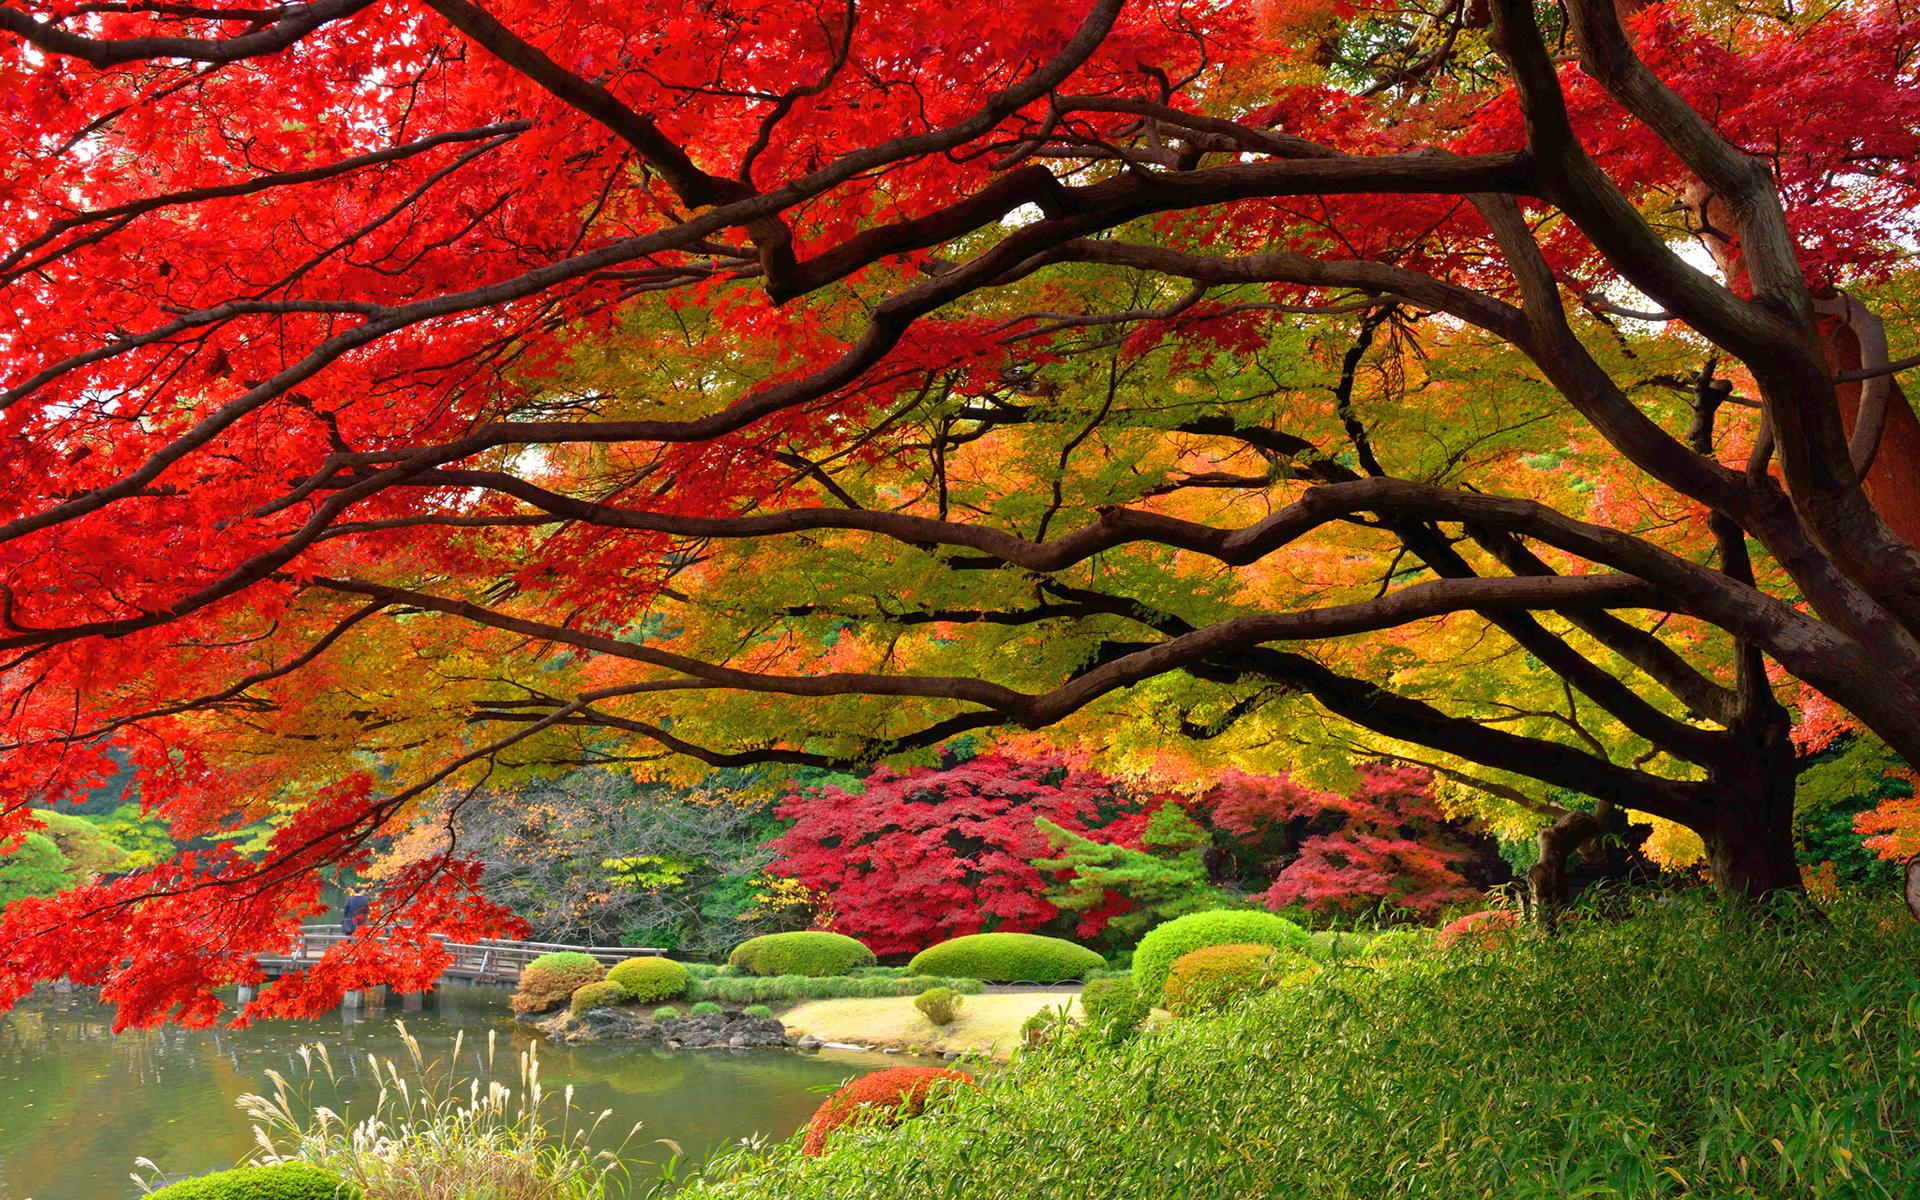 Autumn wallpaper japan hd hd desktop wallpapers 4k hd for Japanese garden colors